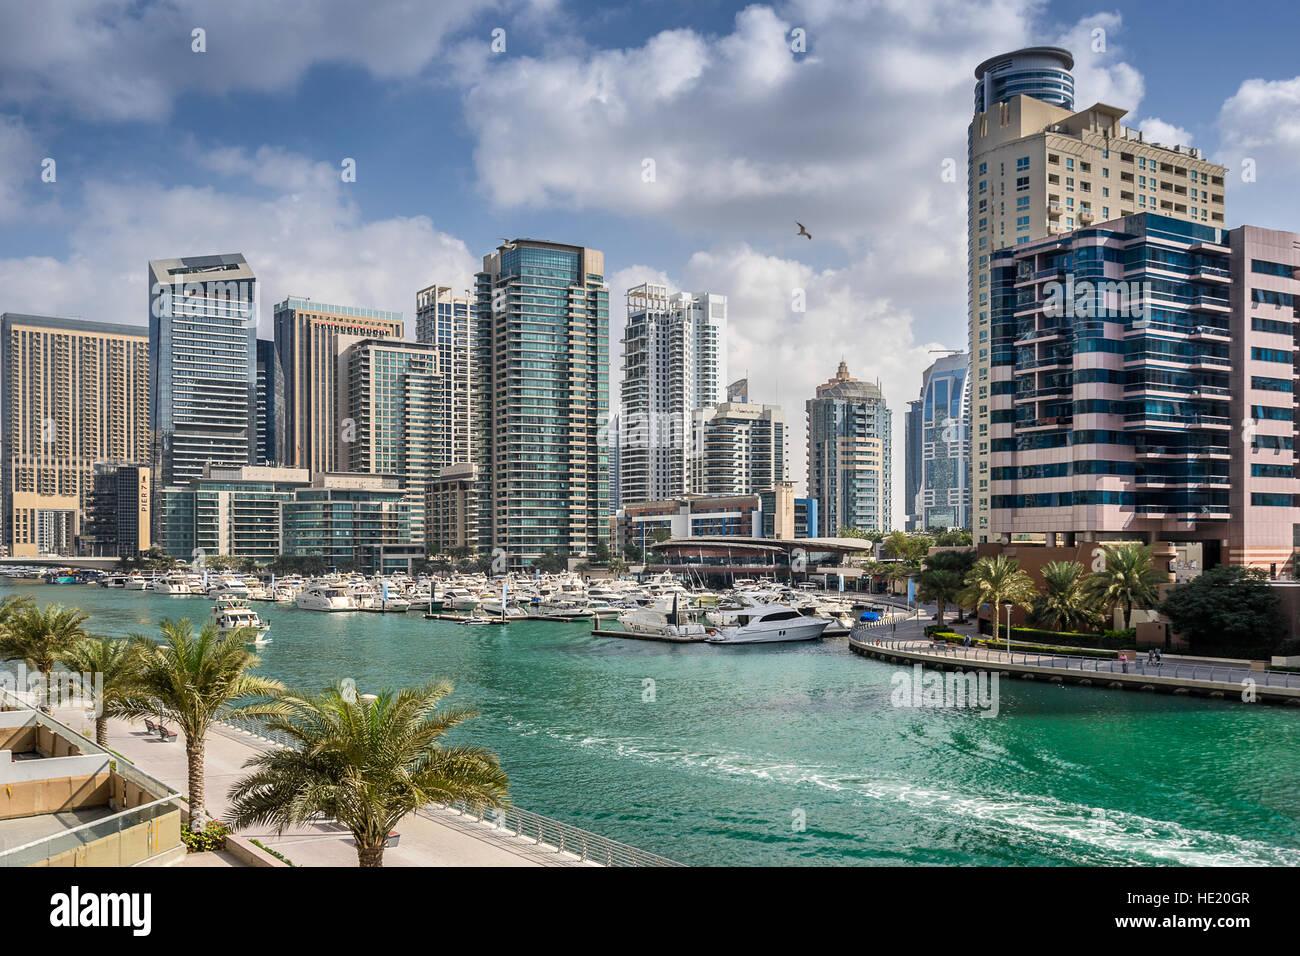 Dubai marina in the UAE - Stock Image